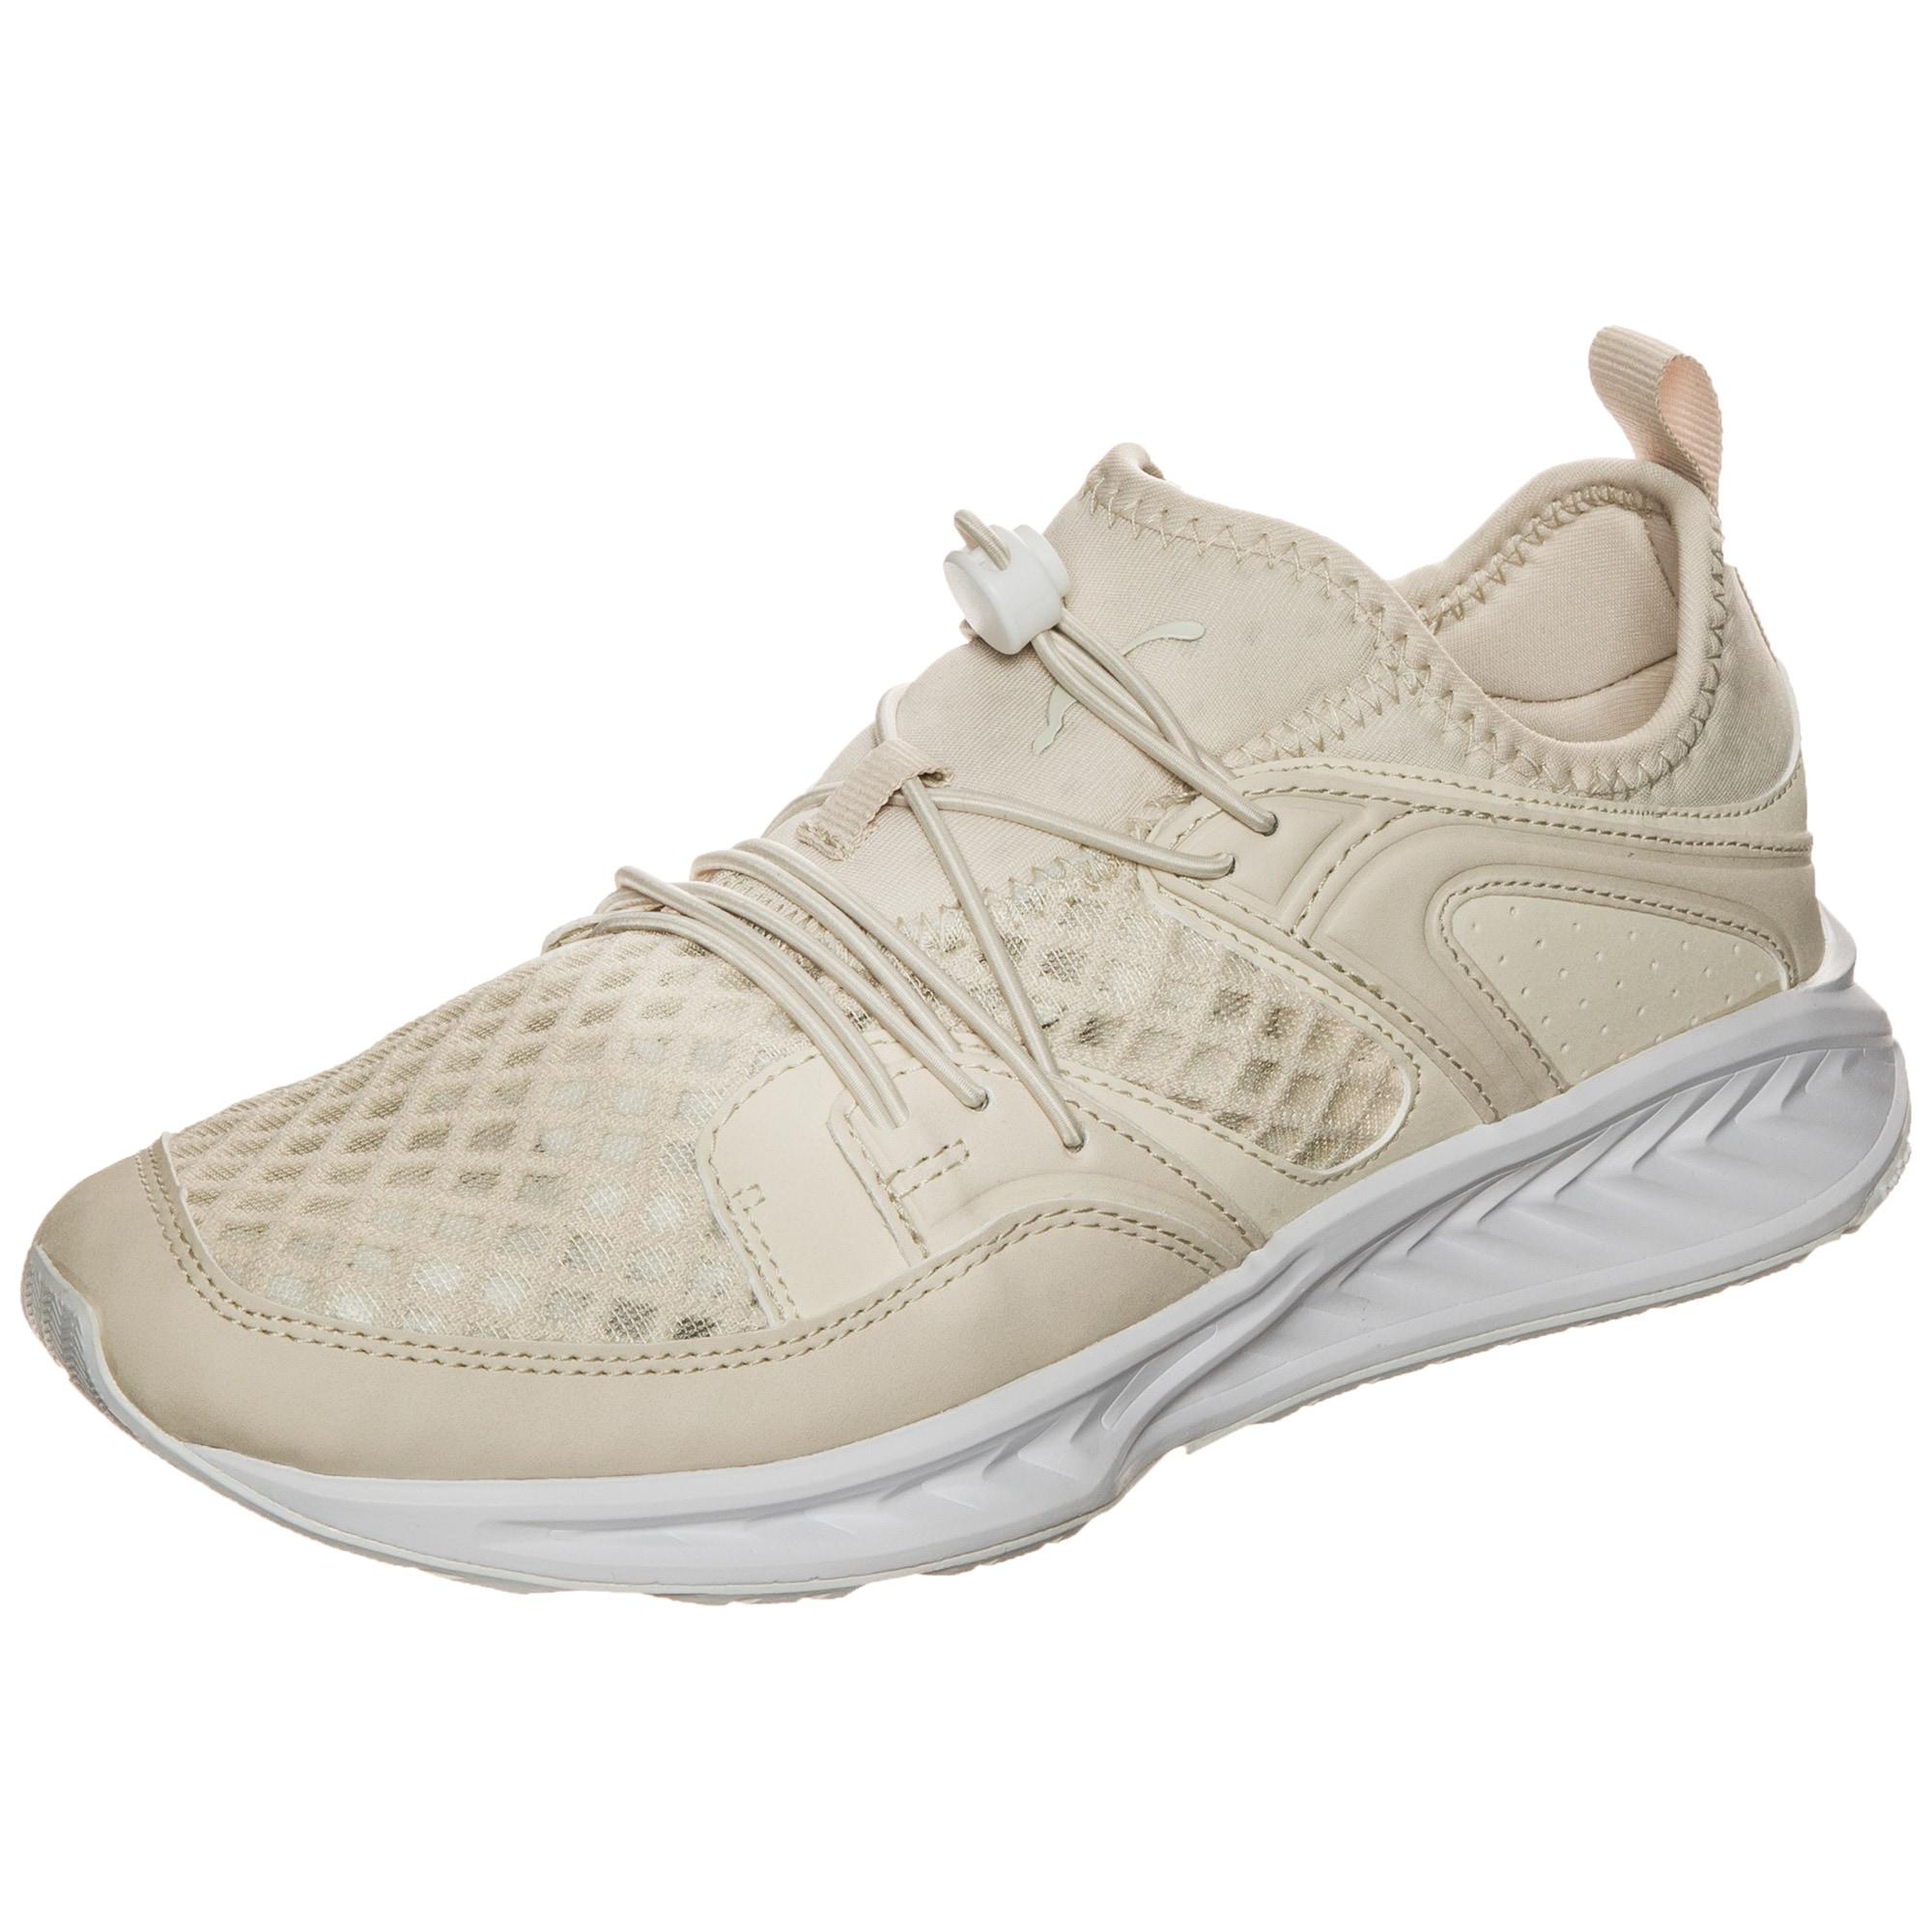 ´Blaze Ignite Plus Breathe´ Sneaker